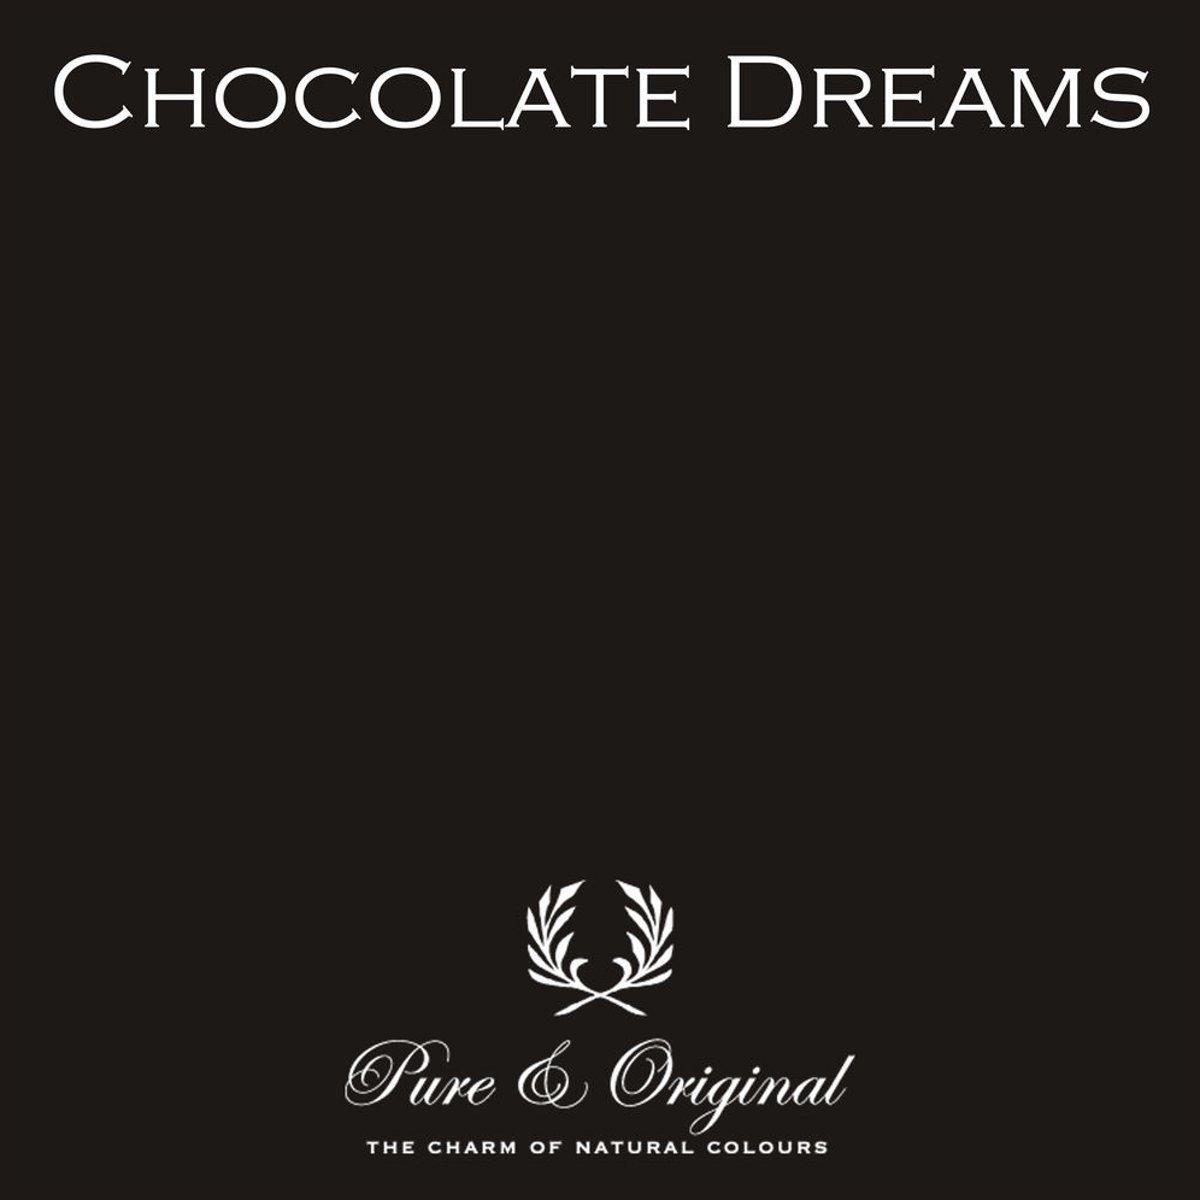 Pure & Original Classico Regular Chocolate Dreams 0.25L